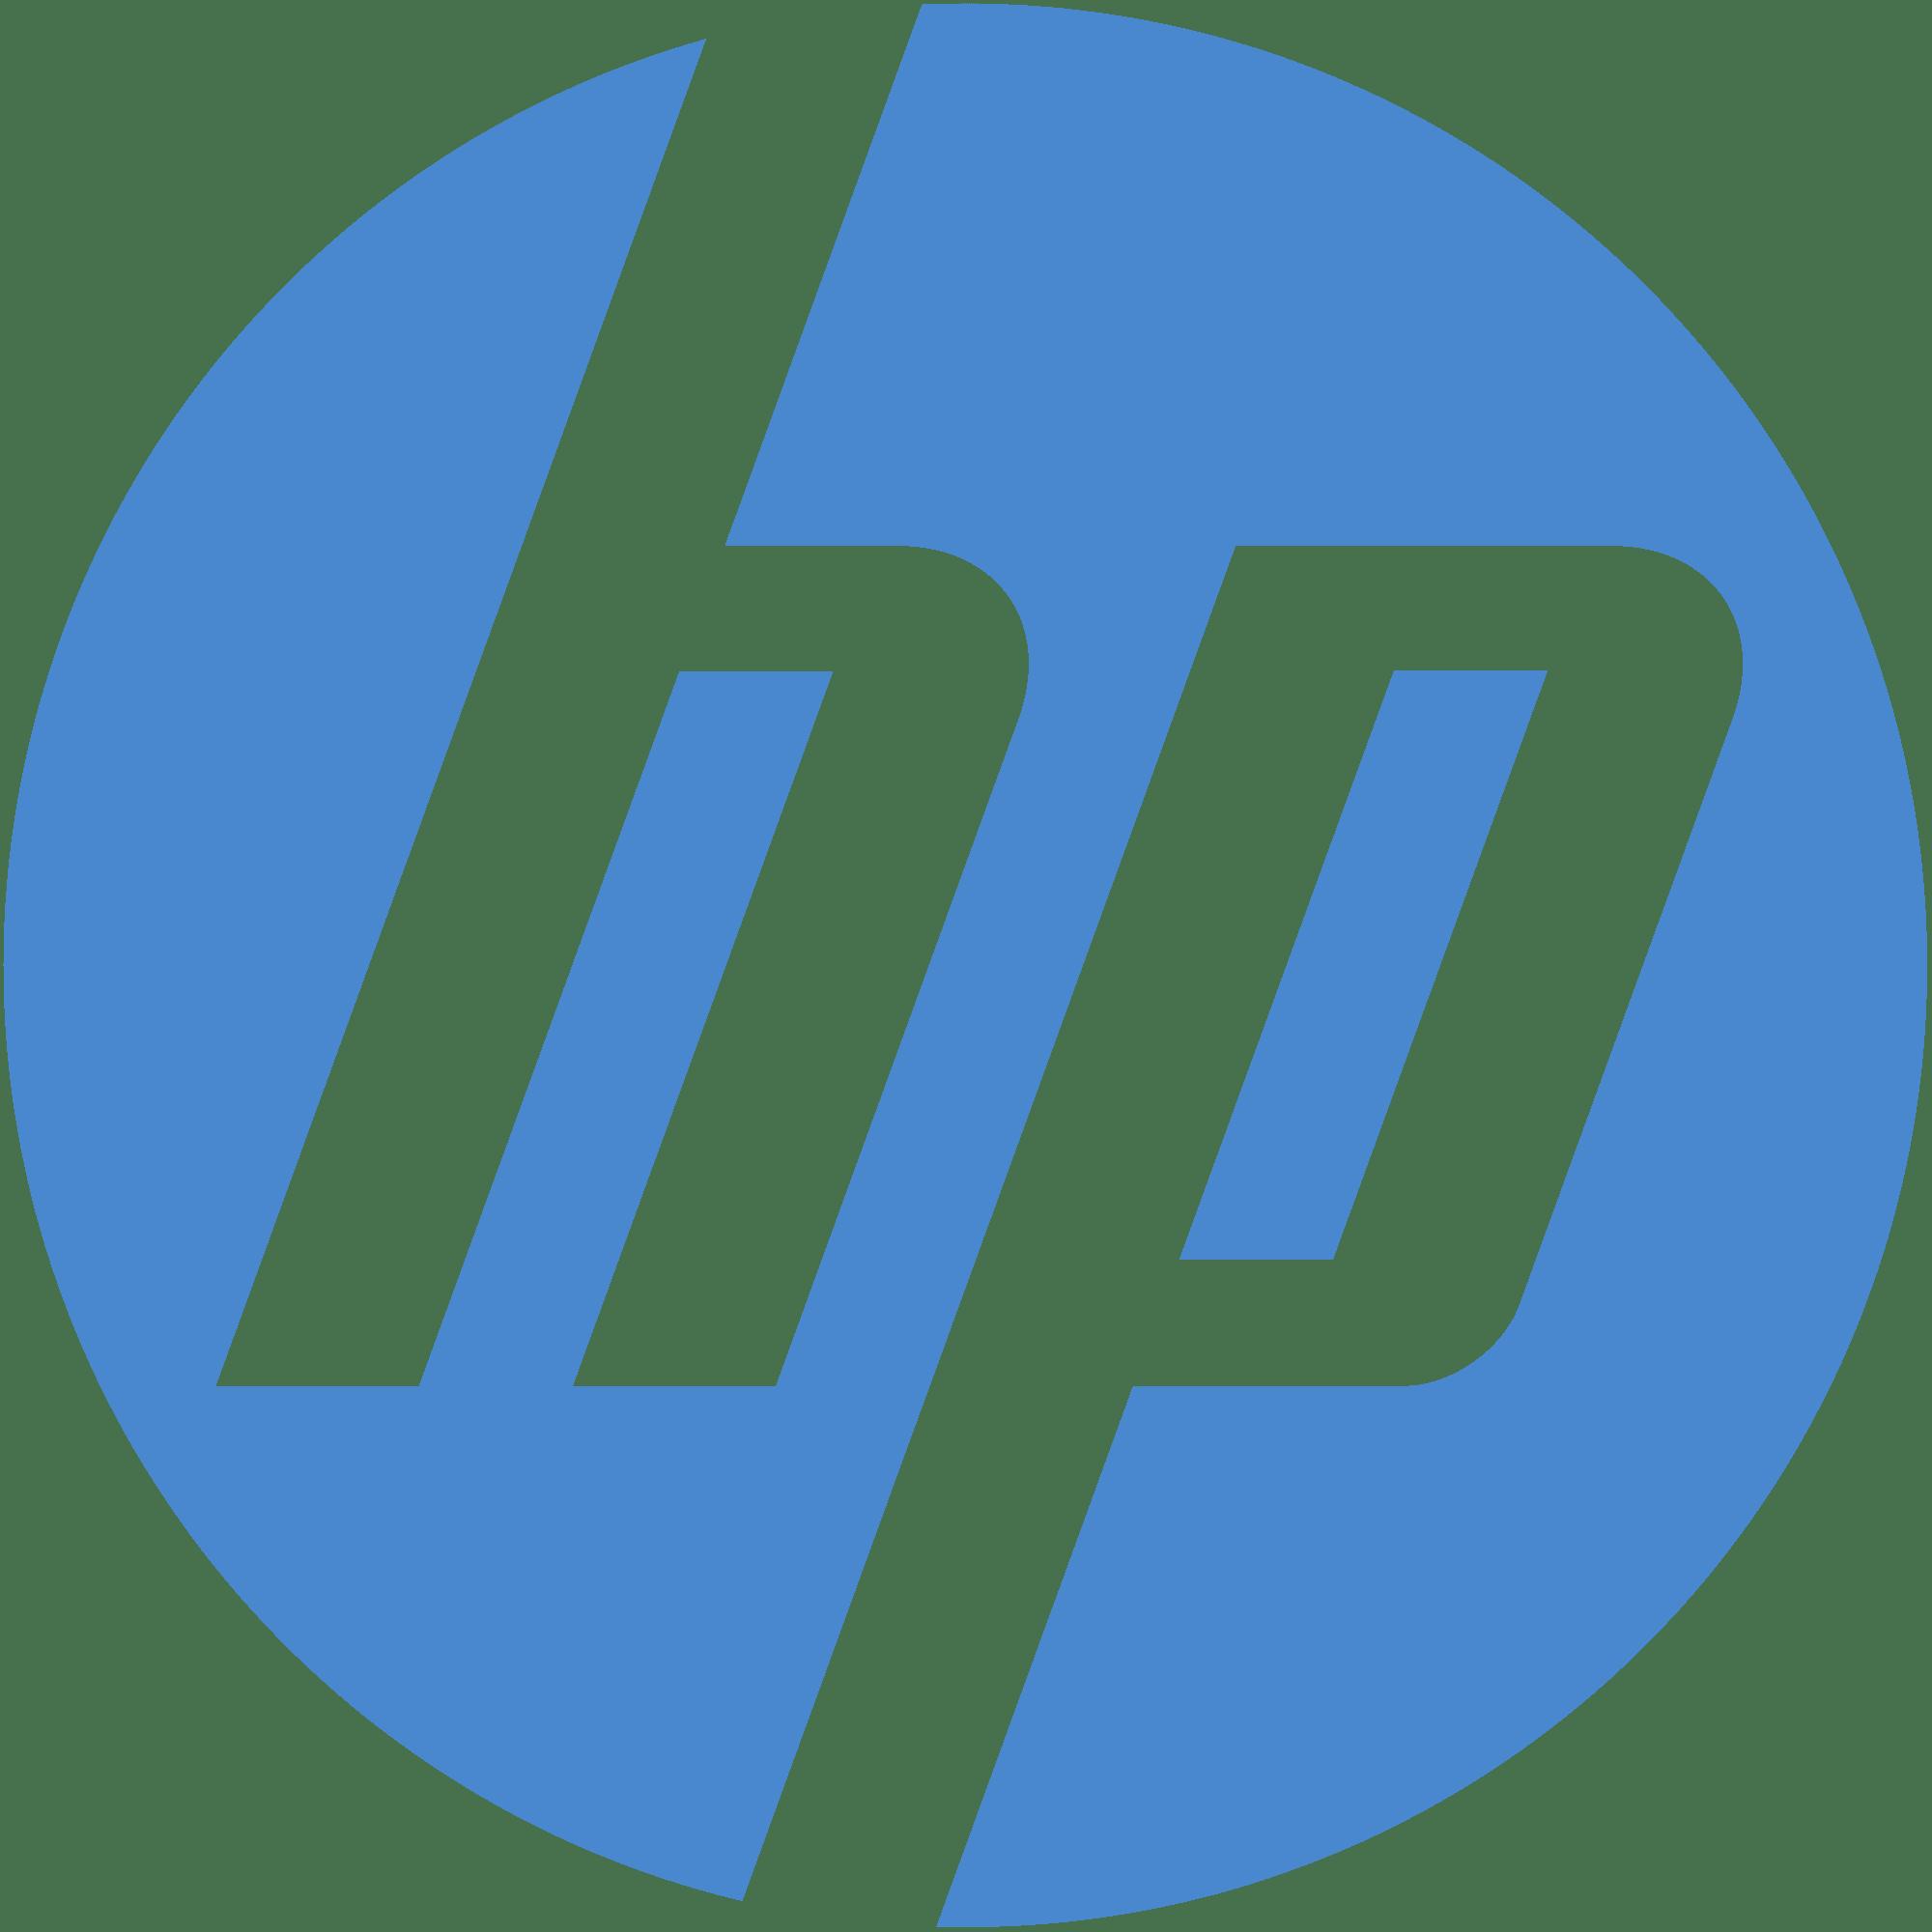 HP Deskjet 3050 Printer J610 Driver